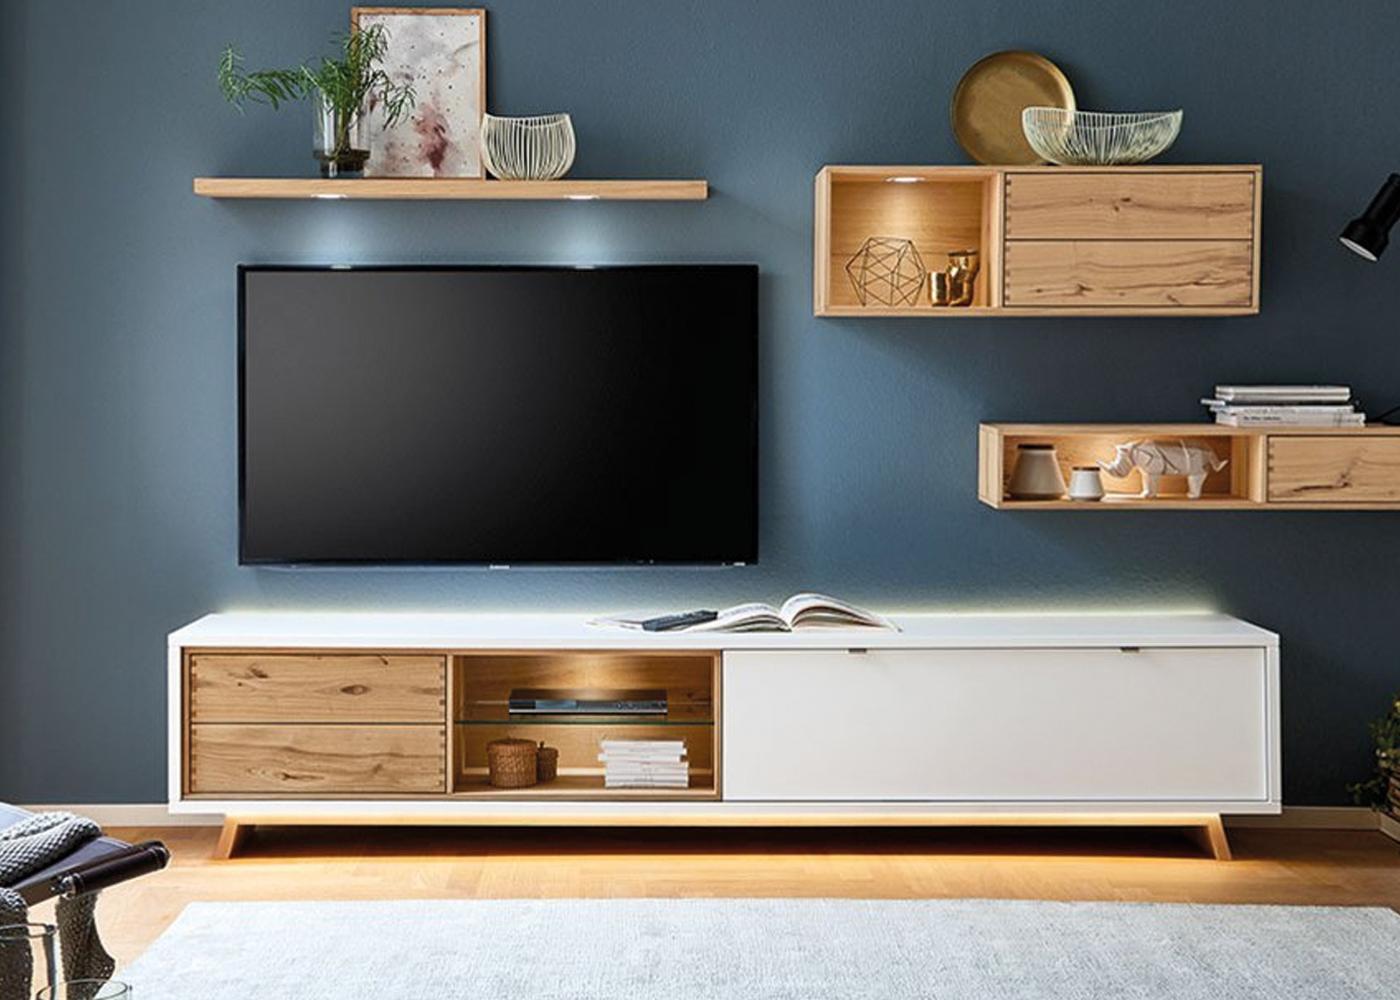 Venjakob Macao Lowboard Midfurn Furniture Superstore